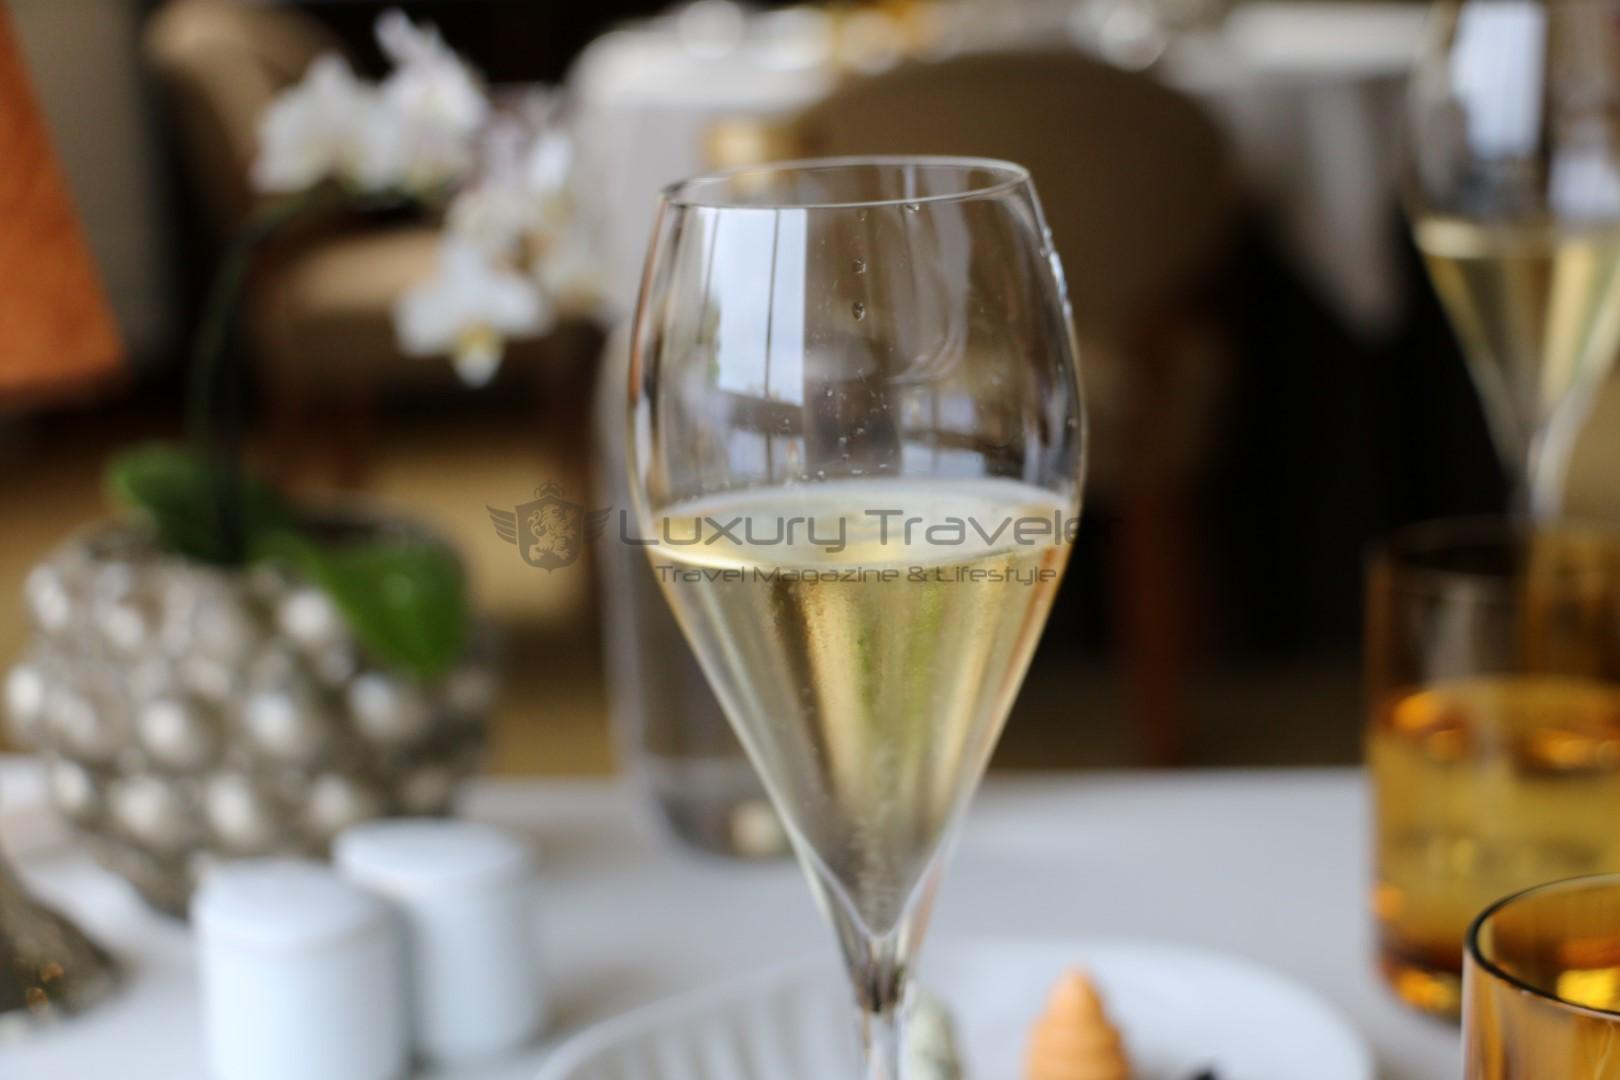 gallo_douro_restaurant_madeira_michelin_star_portugal_island